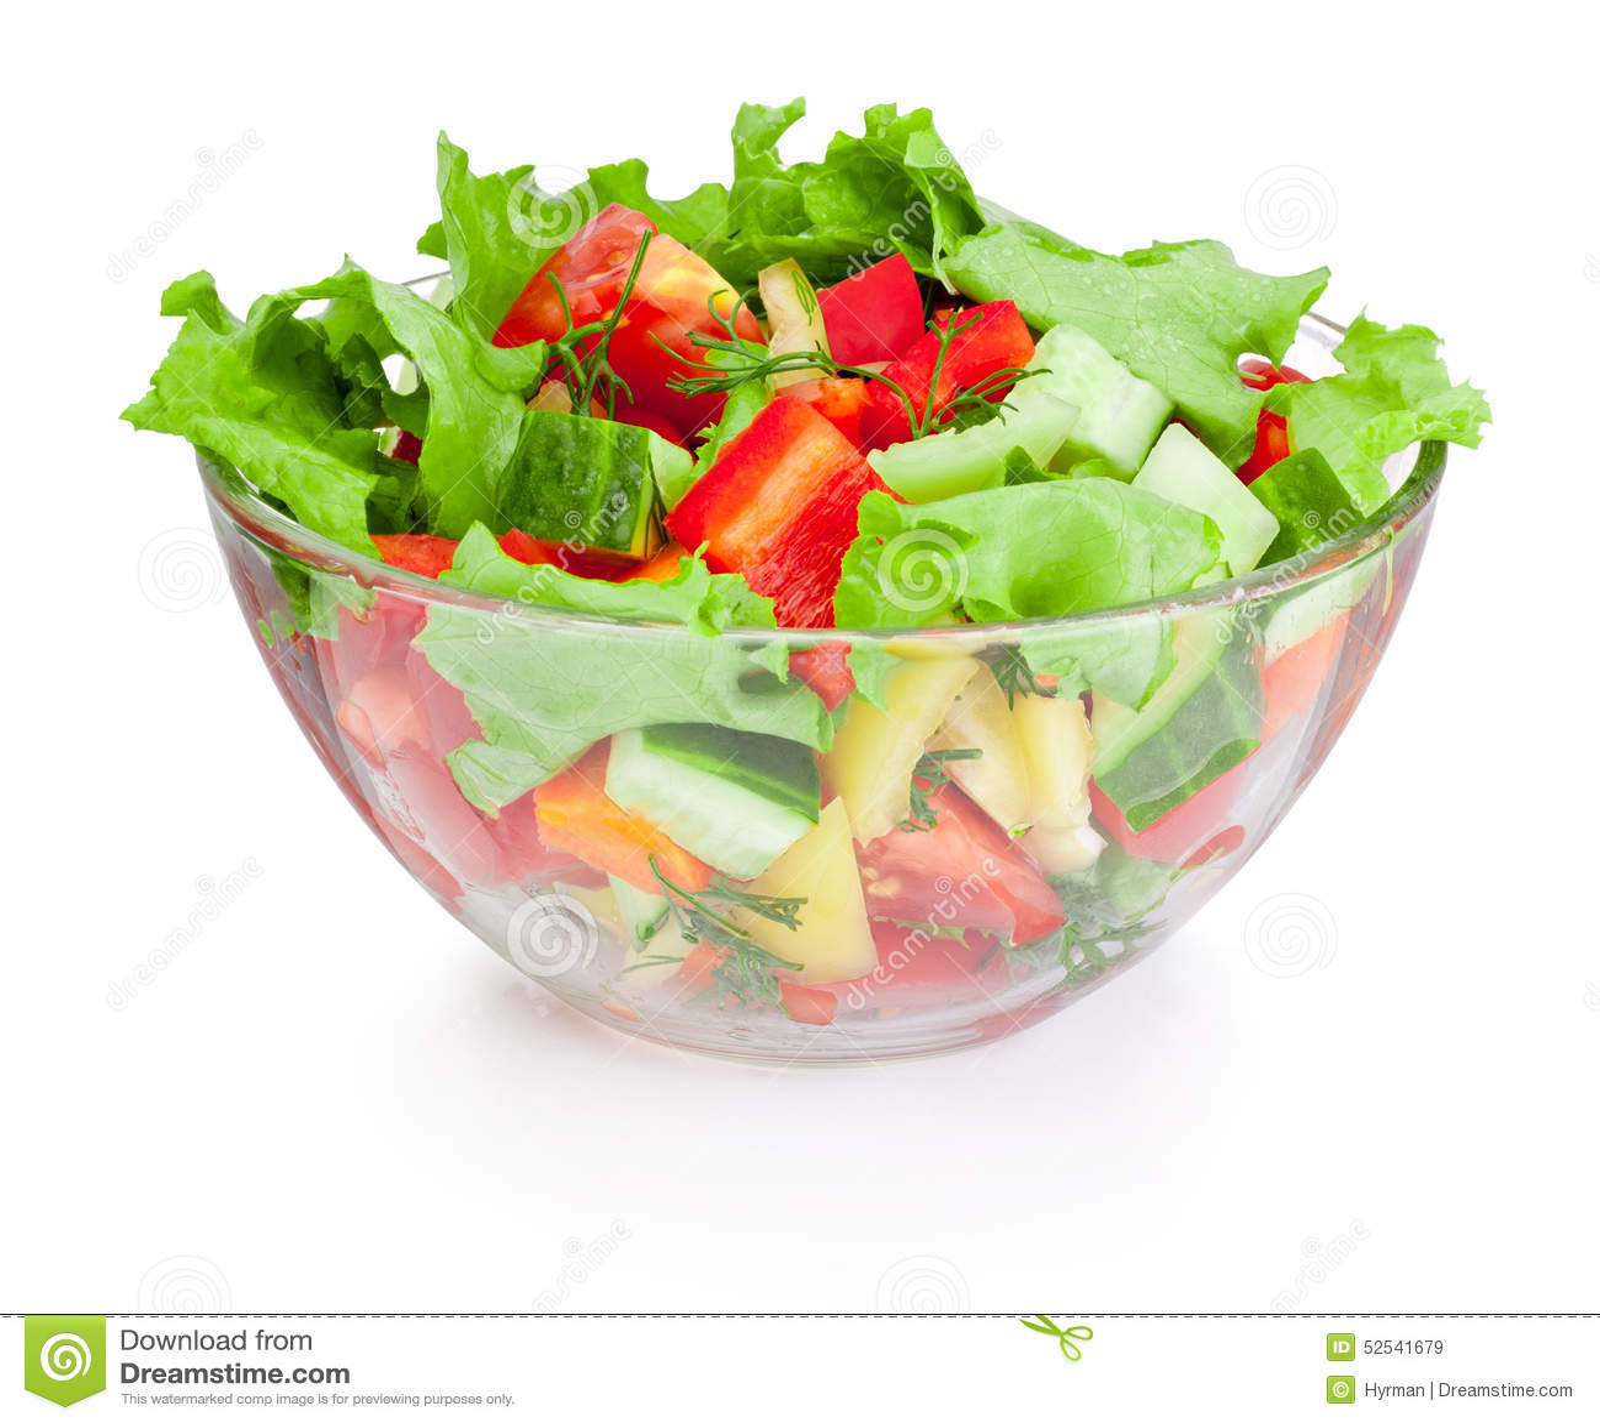 Salada do legume fresco na bacia de vidro isolada no fundo branco